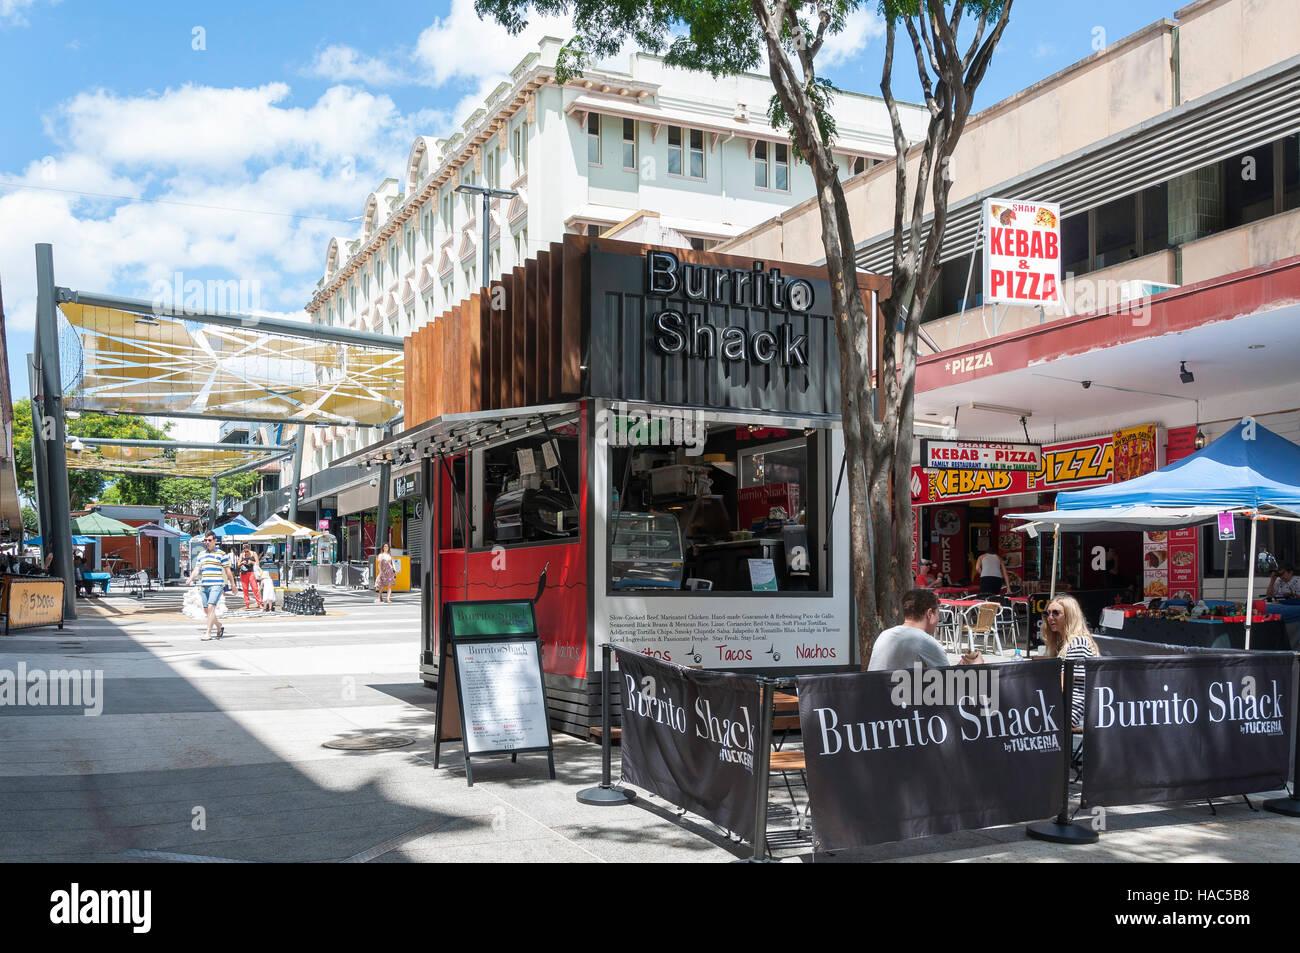 Burrito Shack restaurant, Brunswick Street Mall, Fortitude Valley, Brisbane, Queensland, Australia - Stock Image